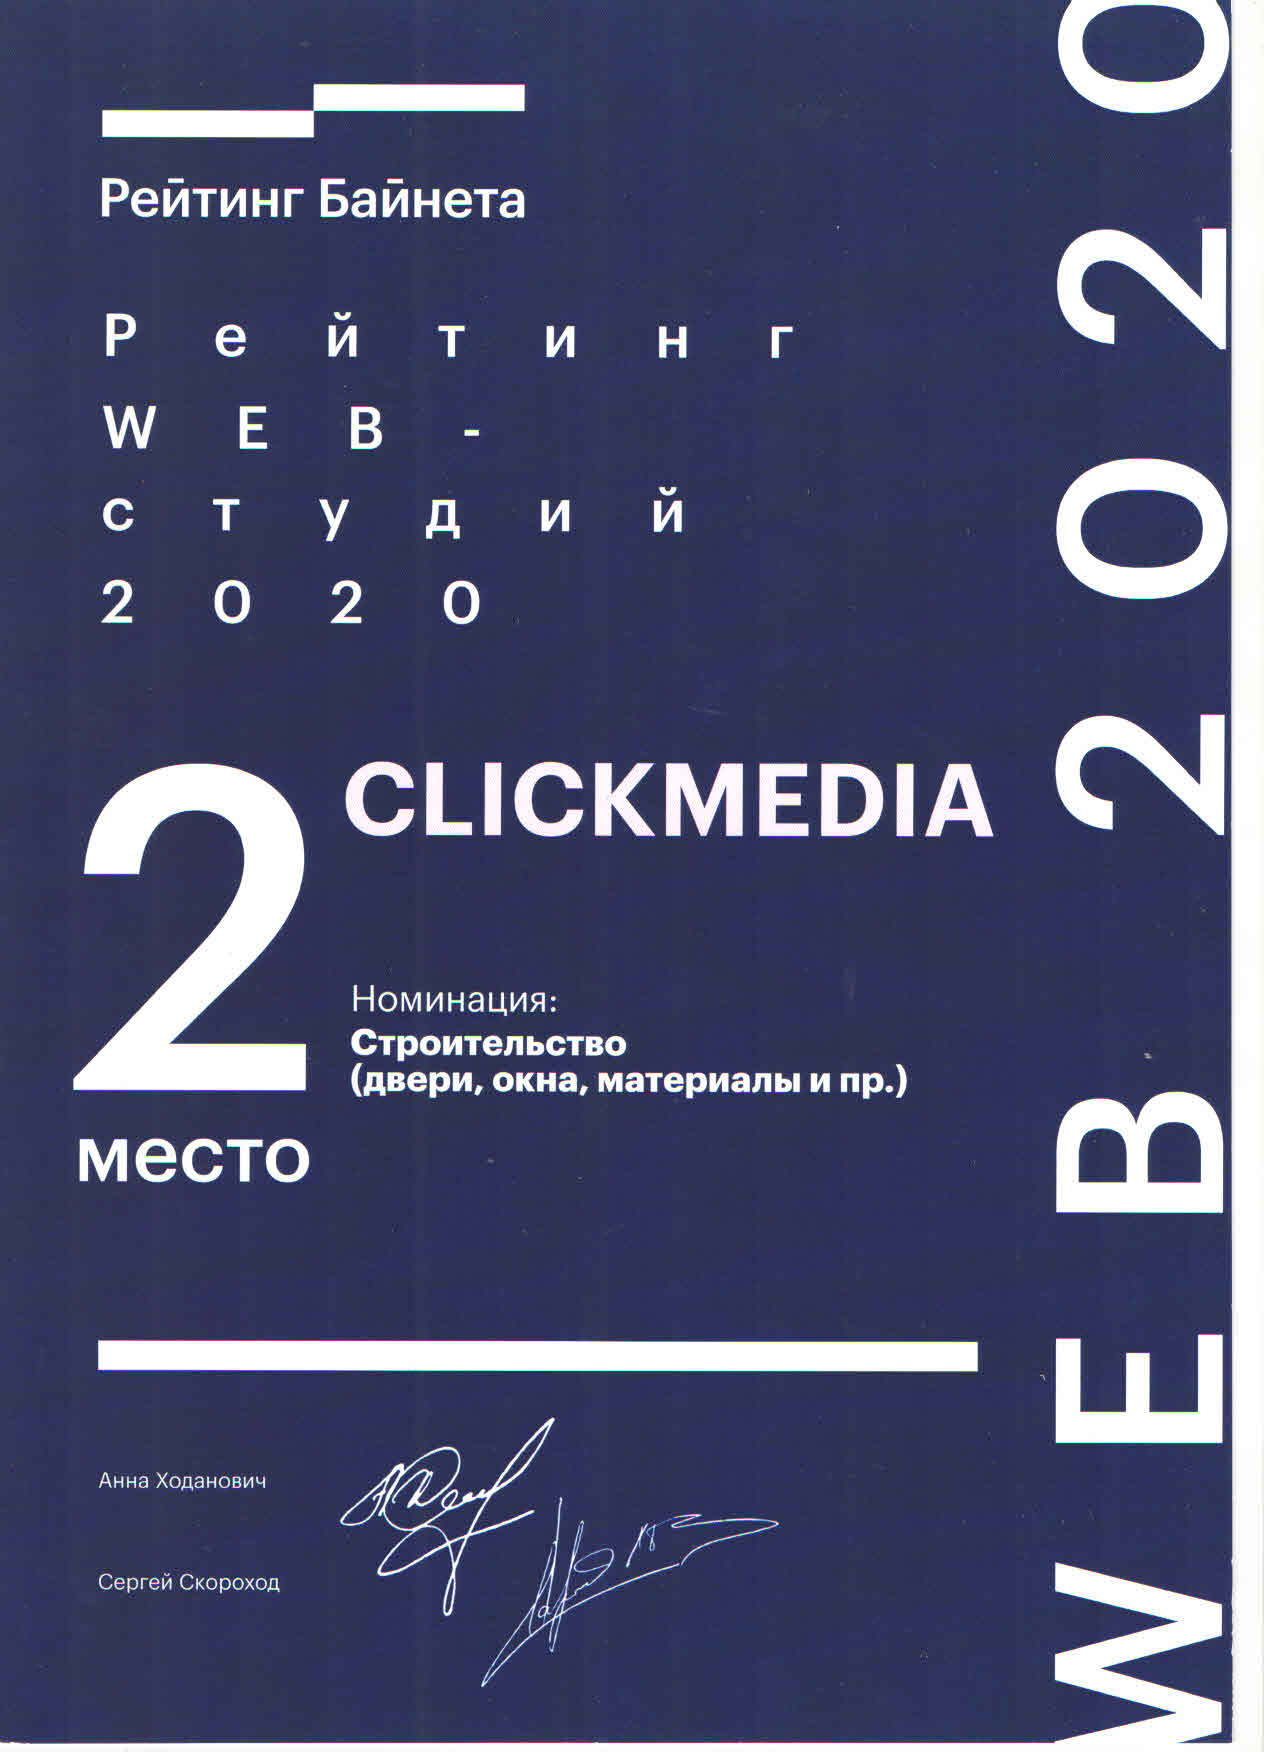 <b>2-е место</b> в рейтинге WEB-студий Беларуси.<br>Номинация:<br><b>Строительство: двери, окна, материалы и пр.</b>